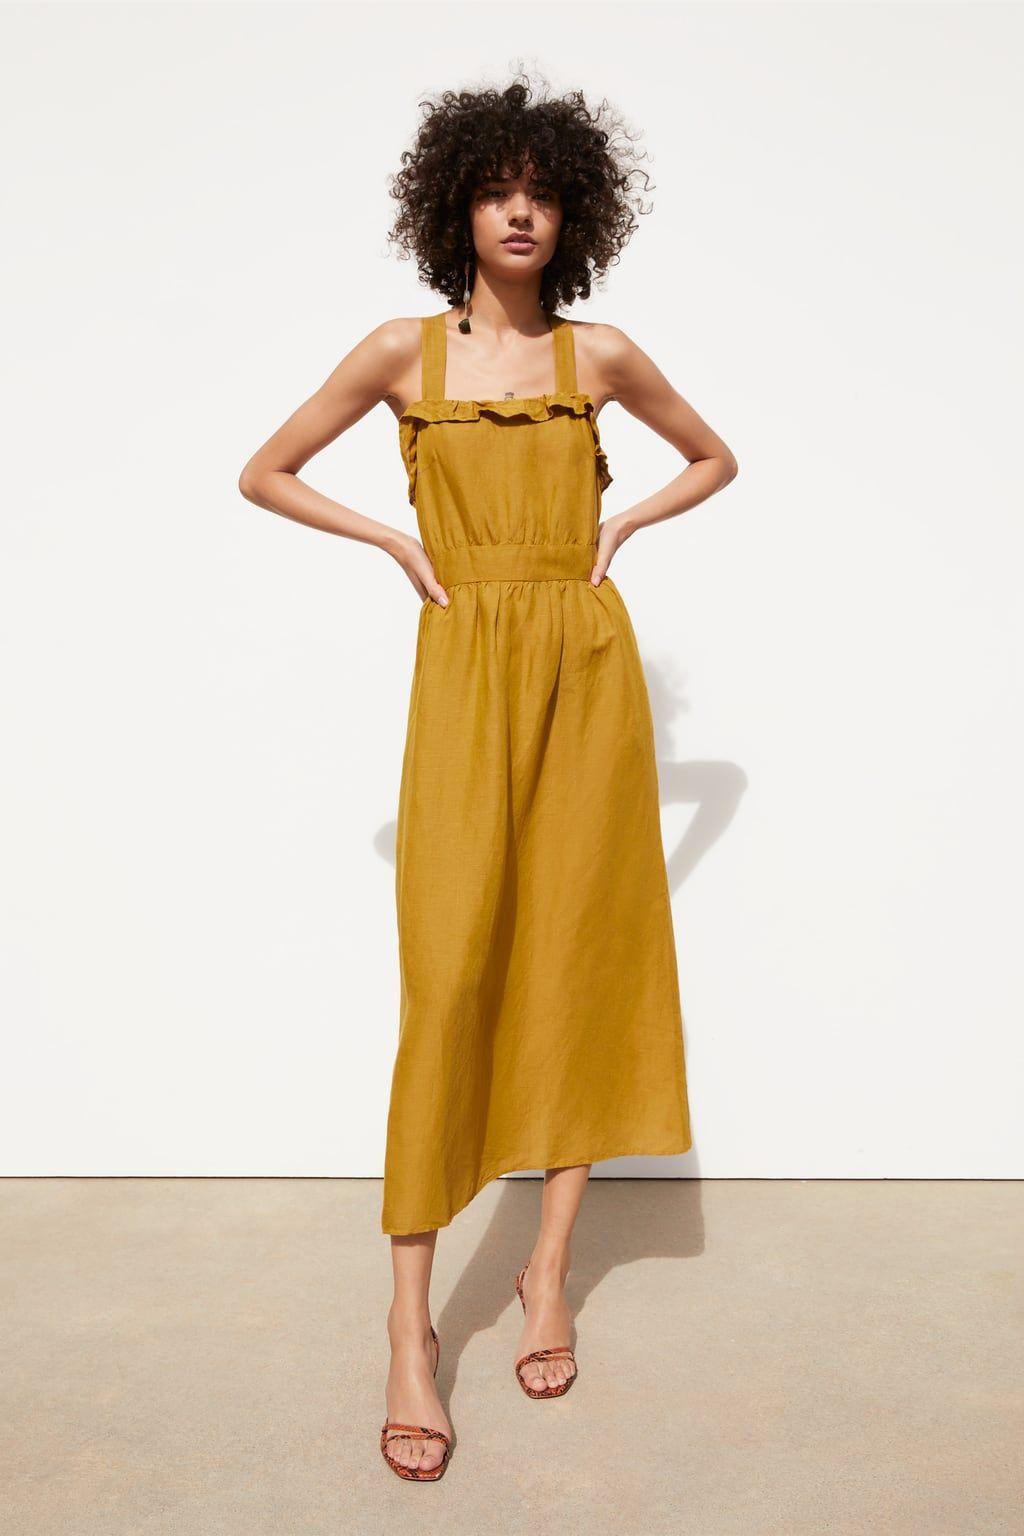 20a47b4ac1e8 RUSTIC DRESS - View all-DRESSES-WOMAN